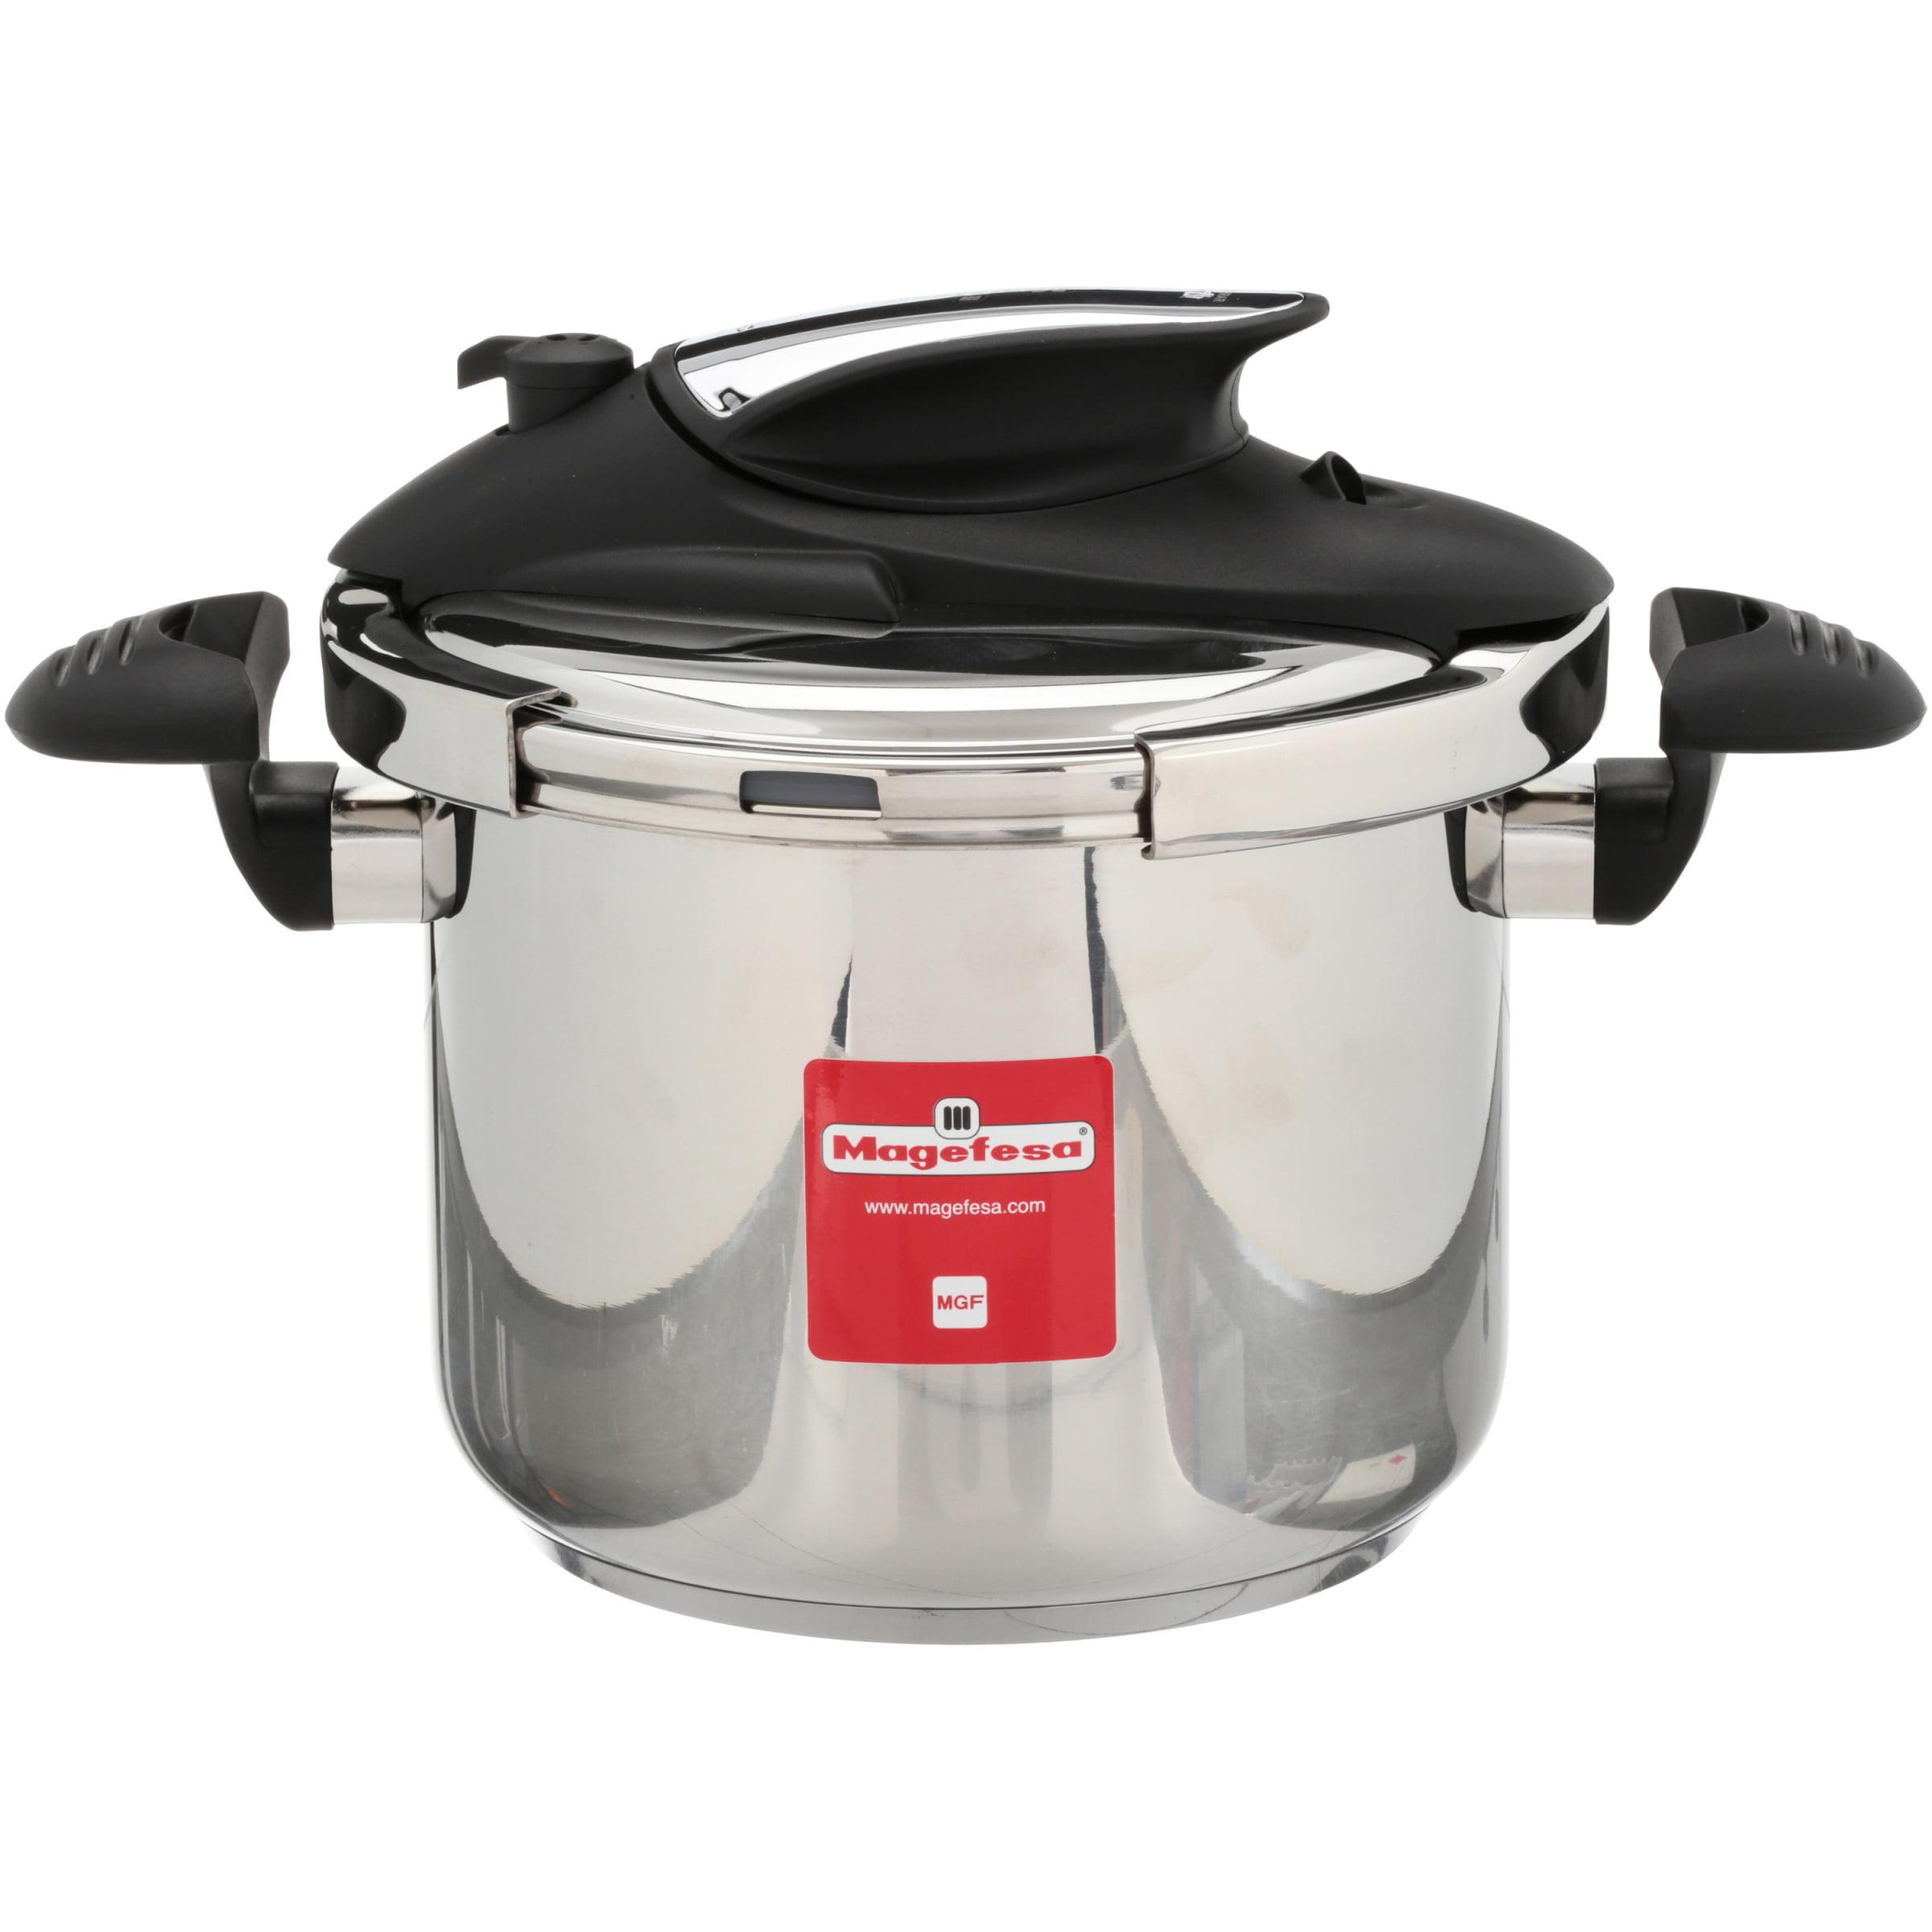 Magefesa Nova 6.3 Qts. Stainless Steel Pressure Cooker